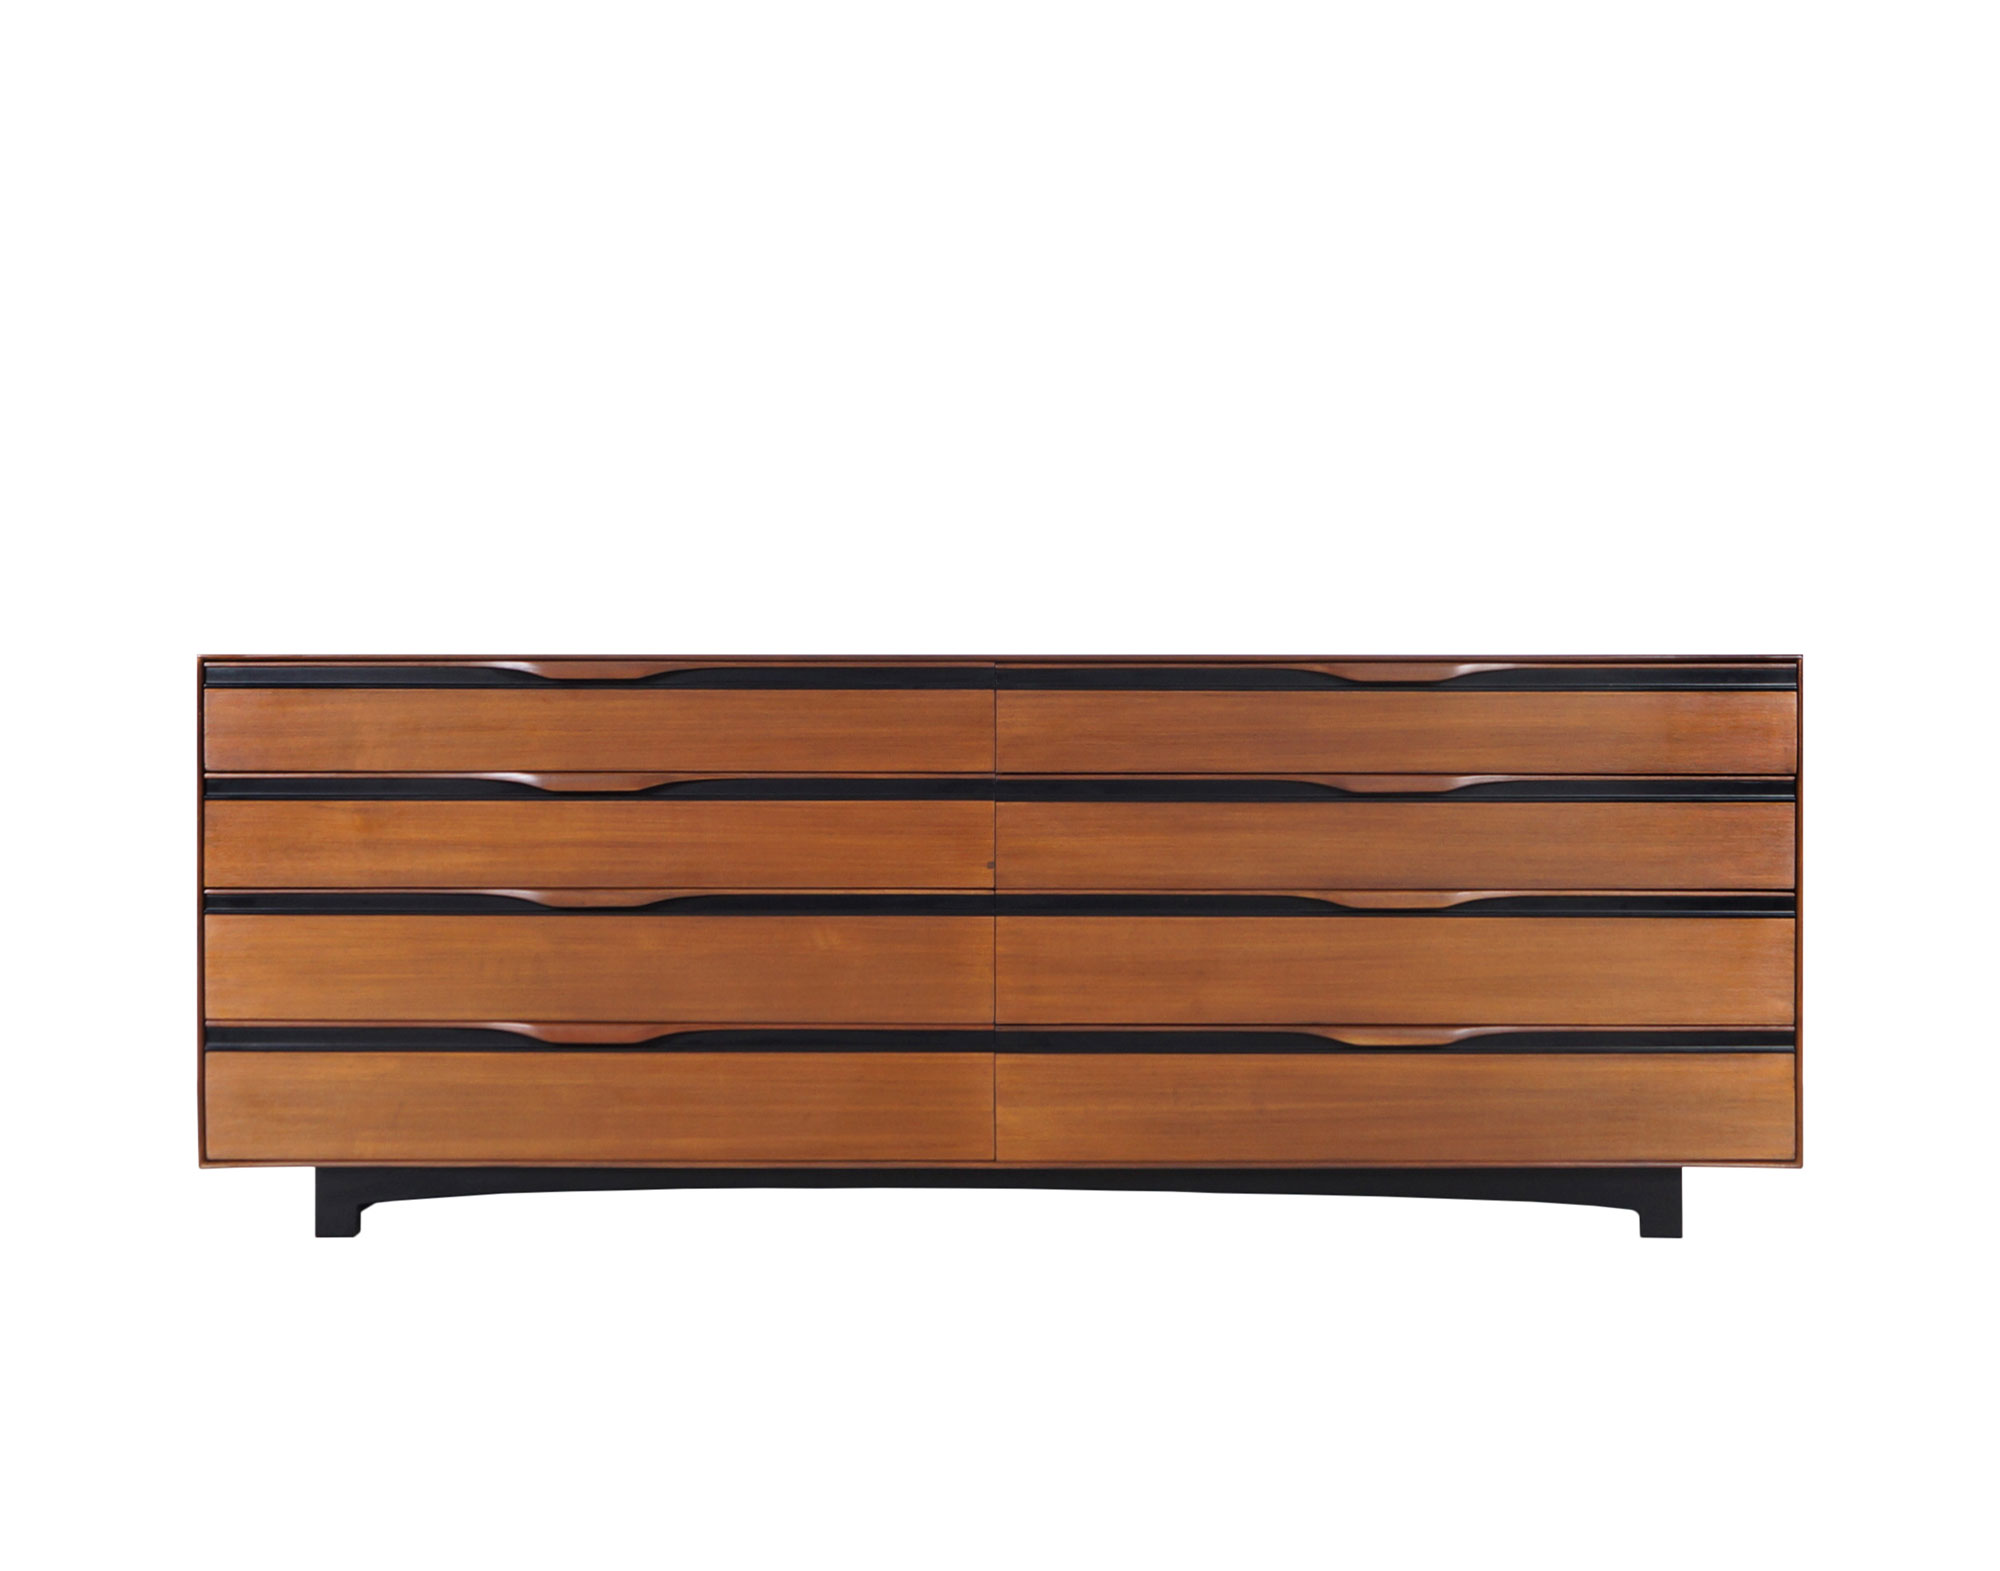 Glenn of California Walnut Dresser by John Kapel